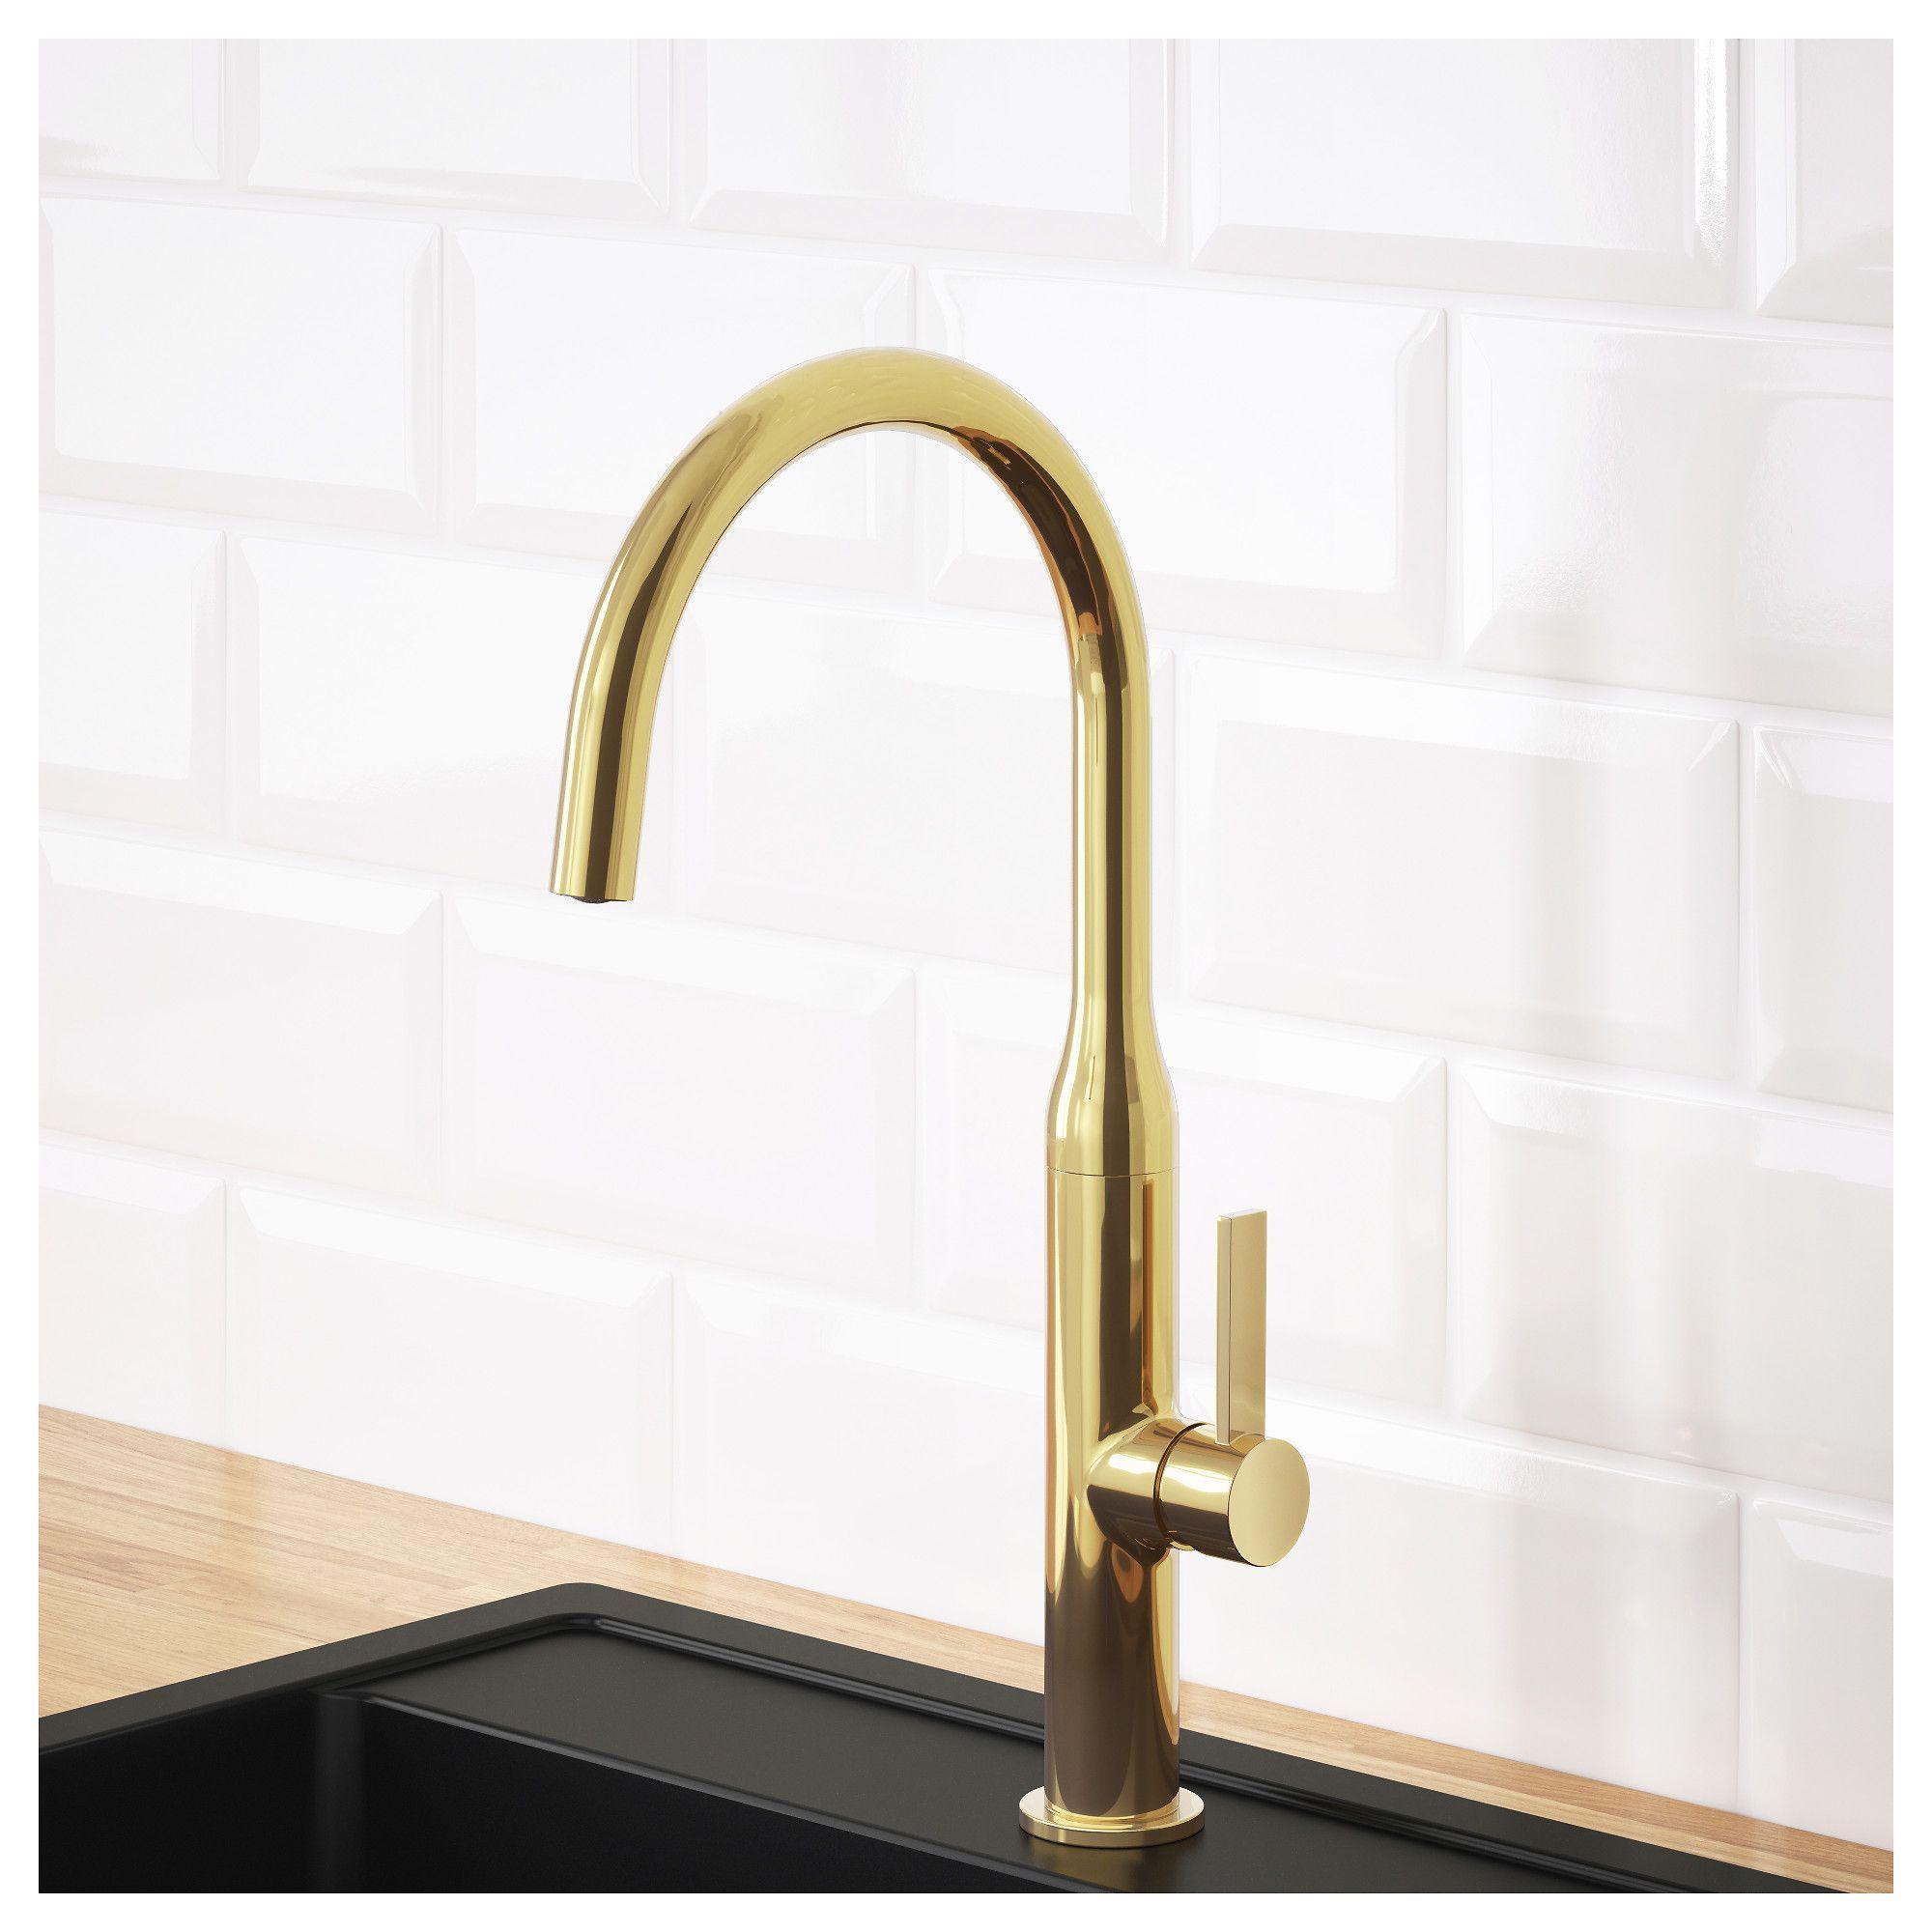 Ikea Nyvattnet Kitchen Faucet Polished Brass Color Brass Kitchen Faucet Brushed Brass Kitchen Faucet Kitchen Faucet